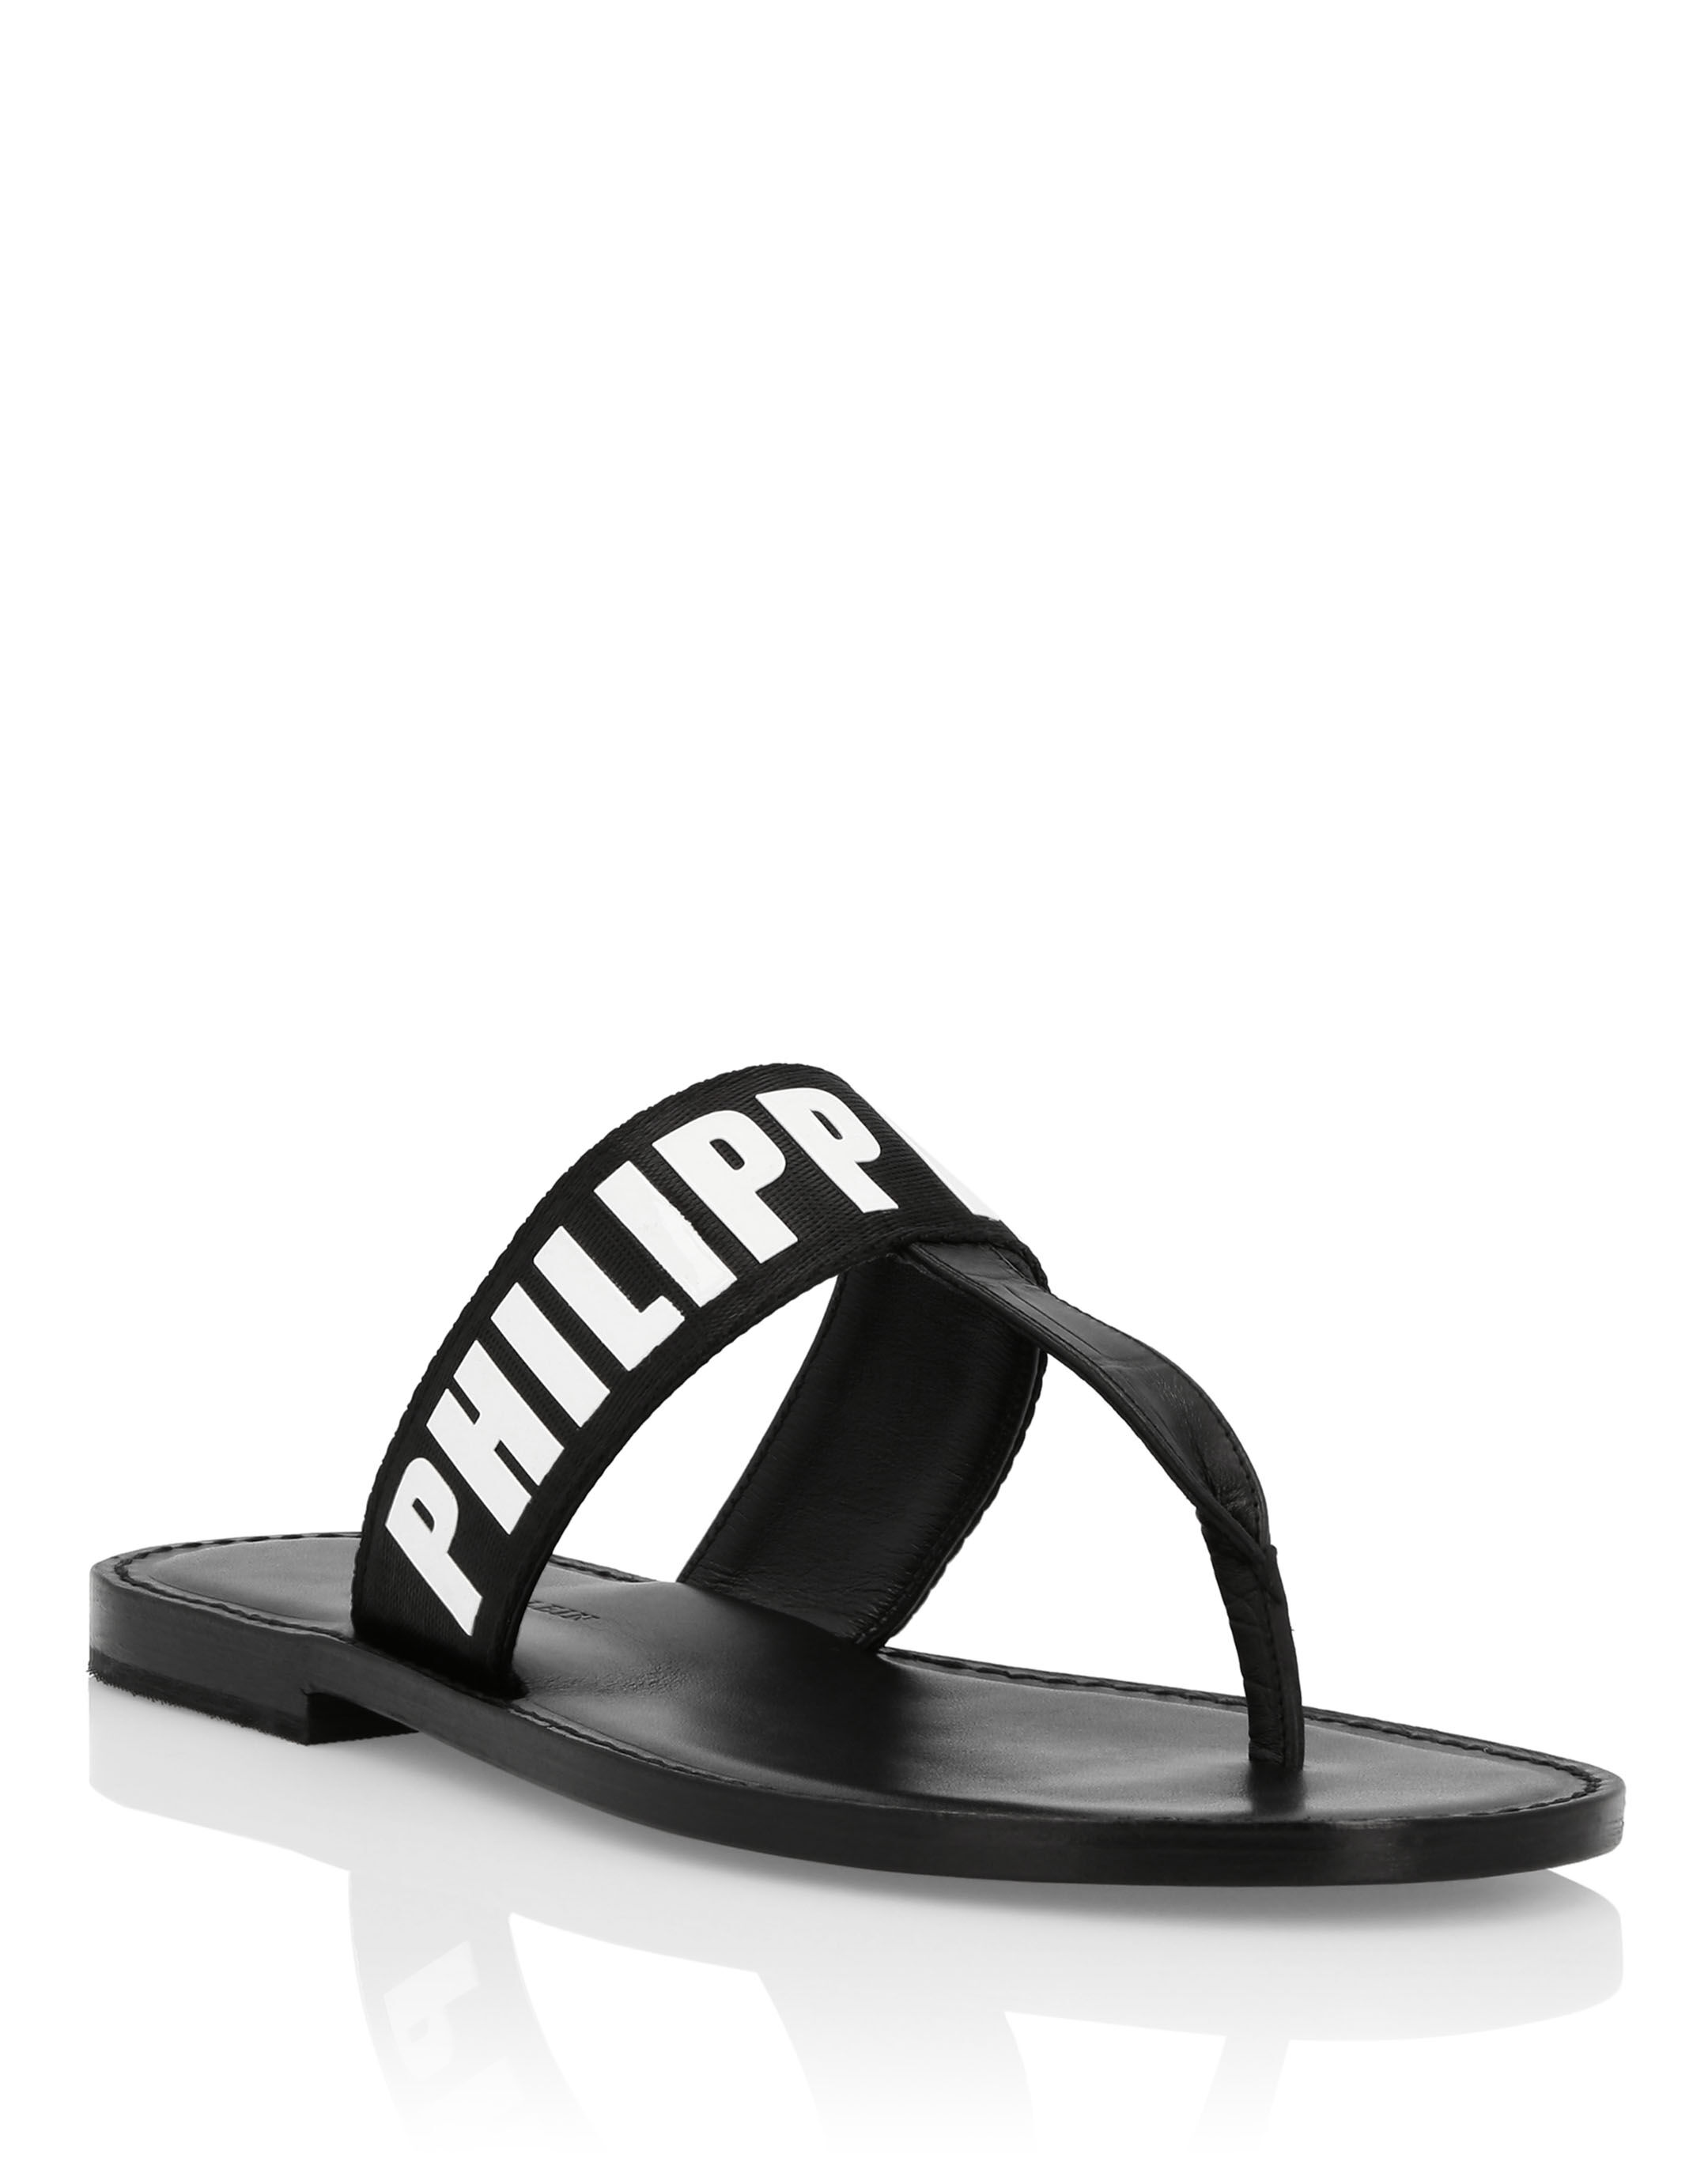 SandalsPhilipp Men's SandalsPhilipp Men's Men's SandalsPhilipp Plein Men's SandalsPhilipp Plein Plein vmwN8n0O